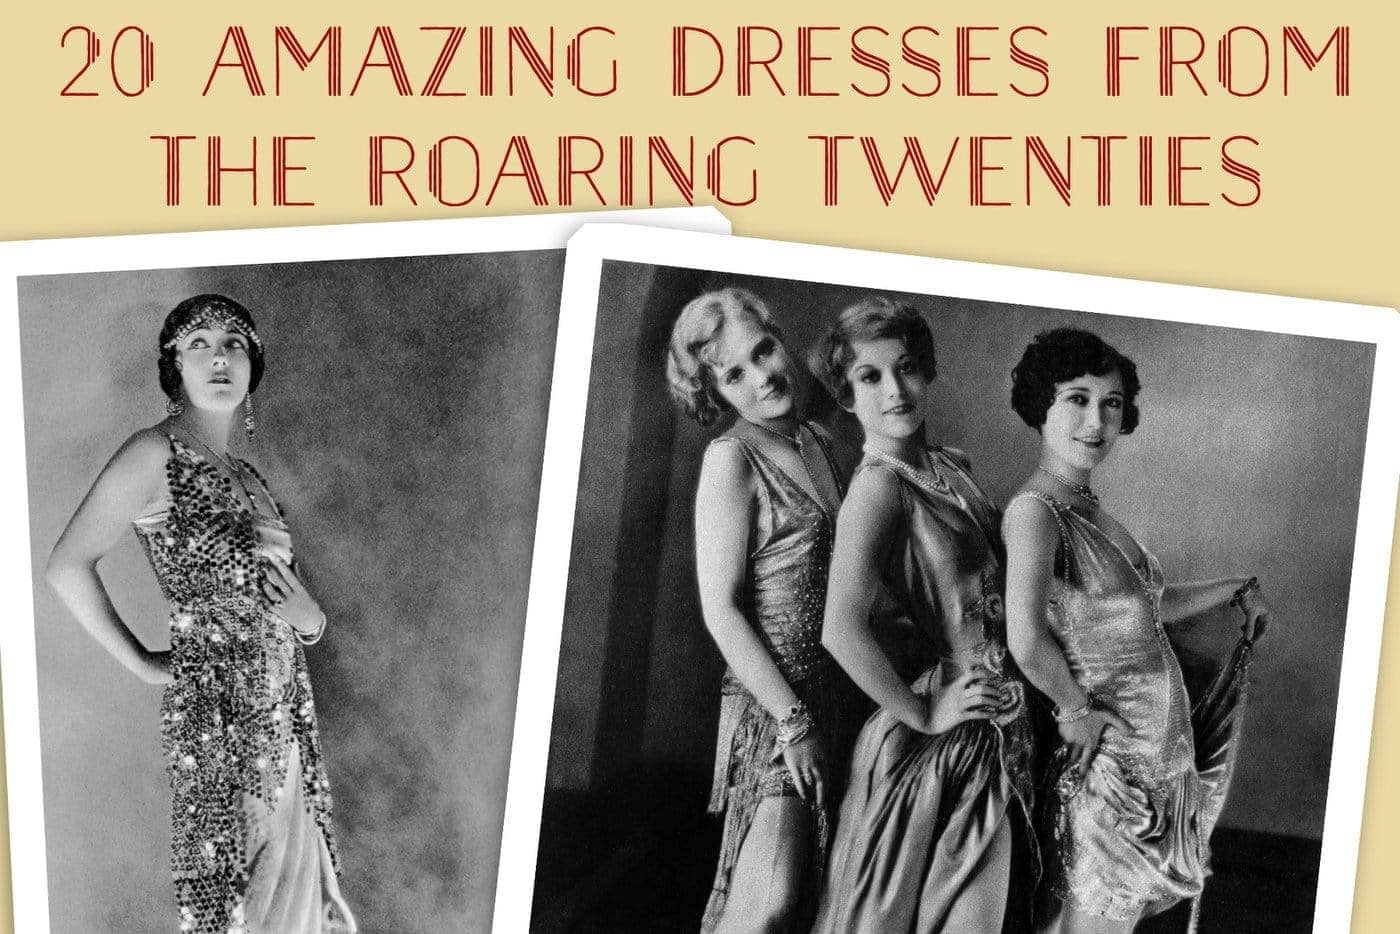 20 amazing dresses from the Roaring Twenties